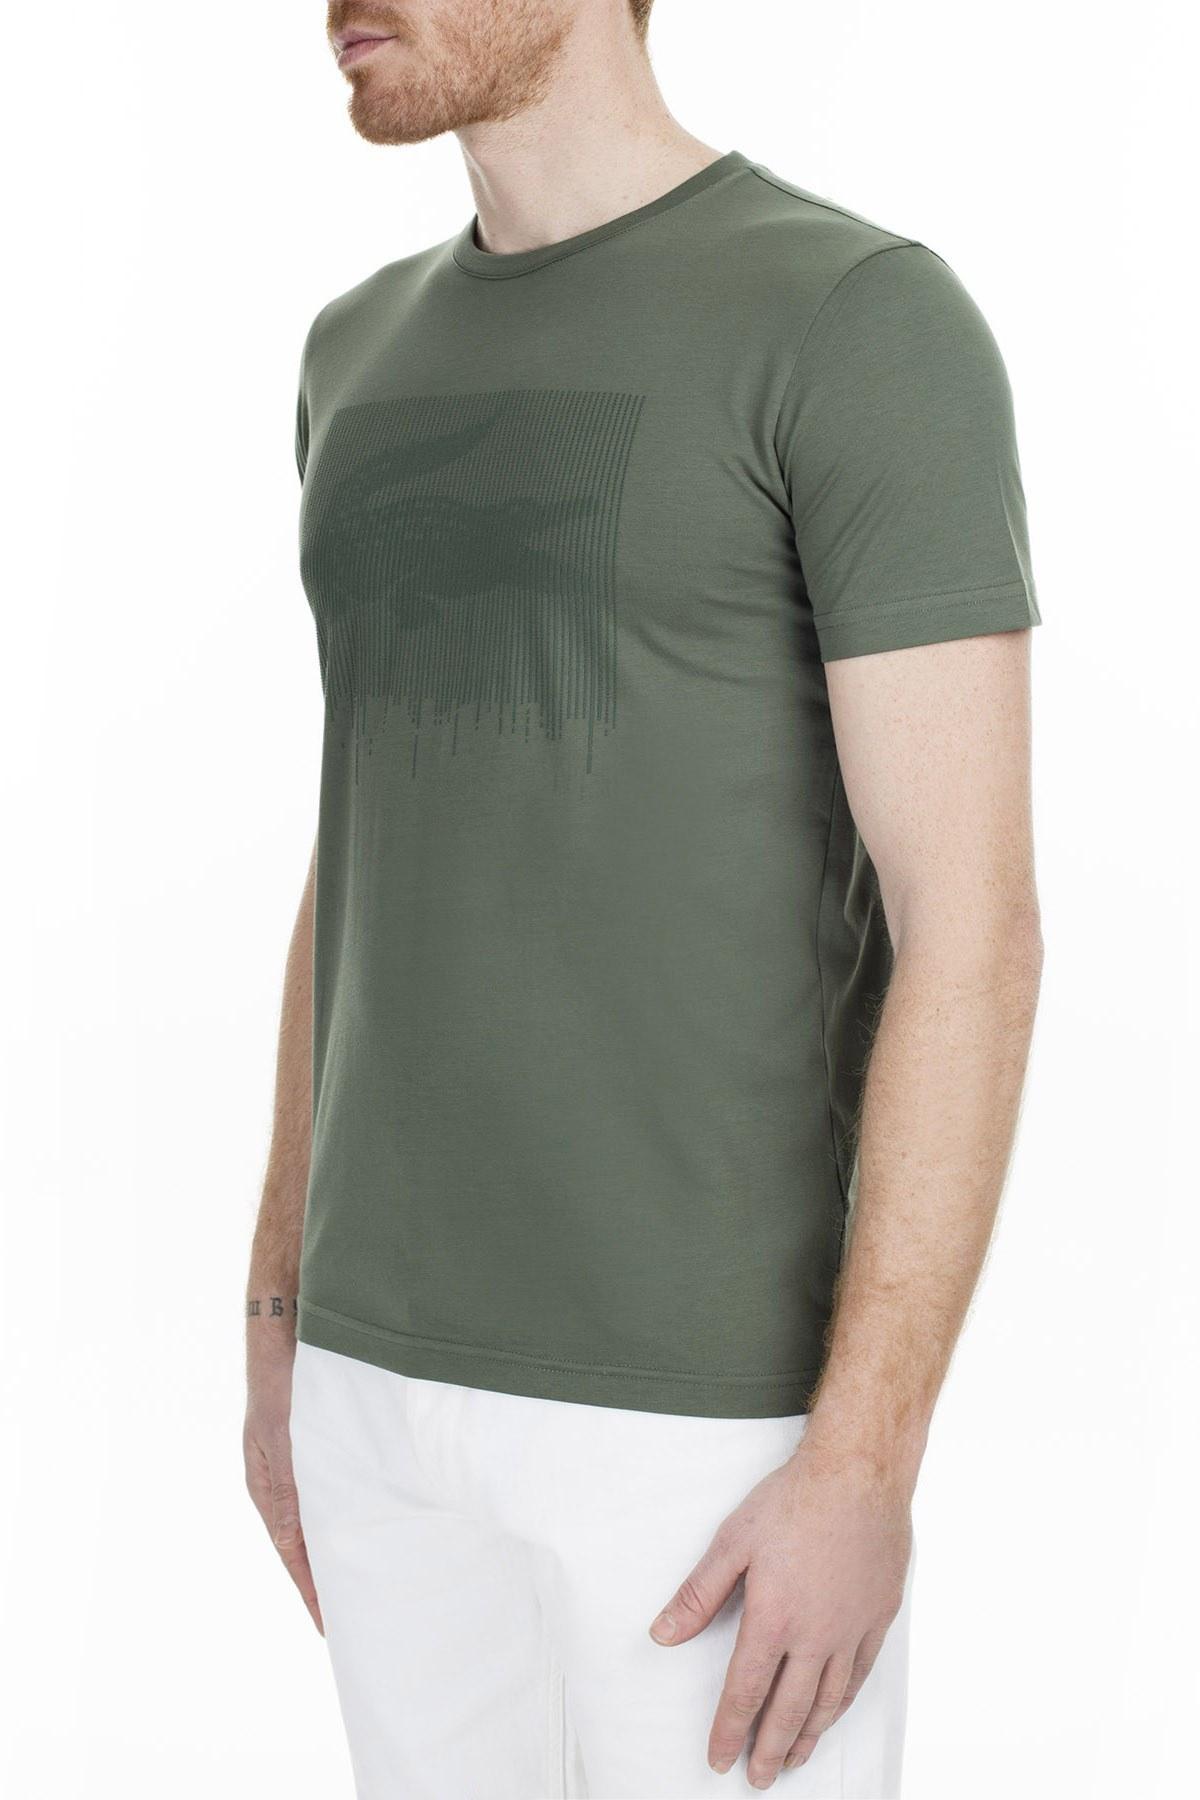 Lacoste Slim Fit Erkek T Shirt TH0013 13H HAKİ